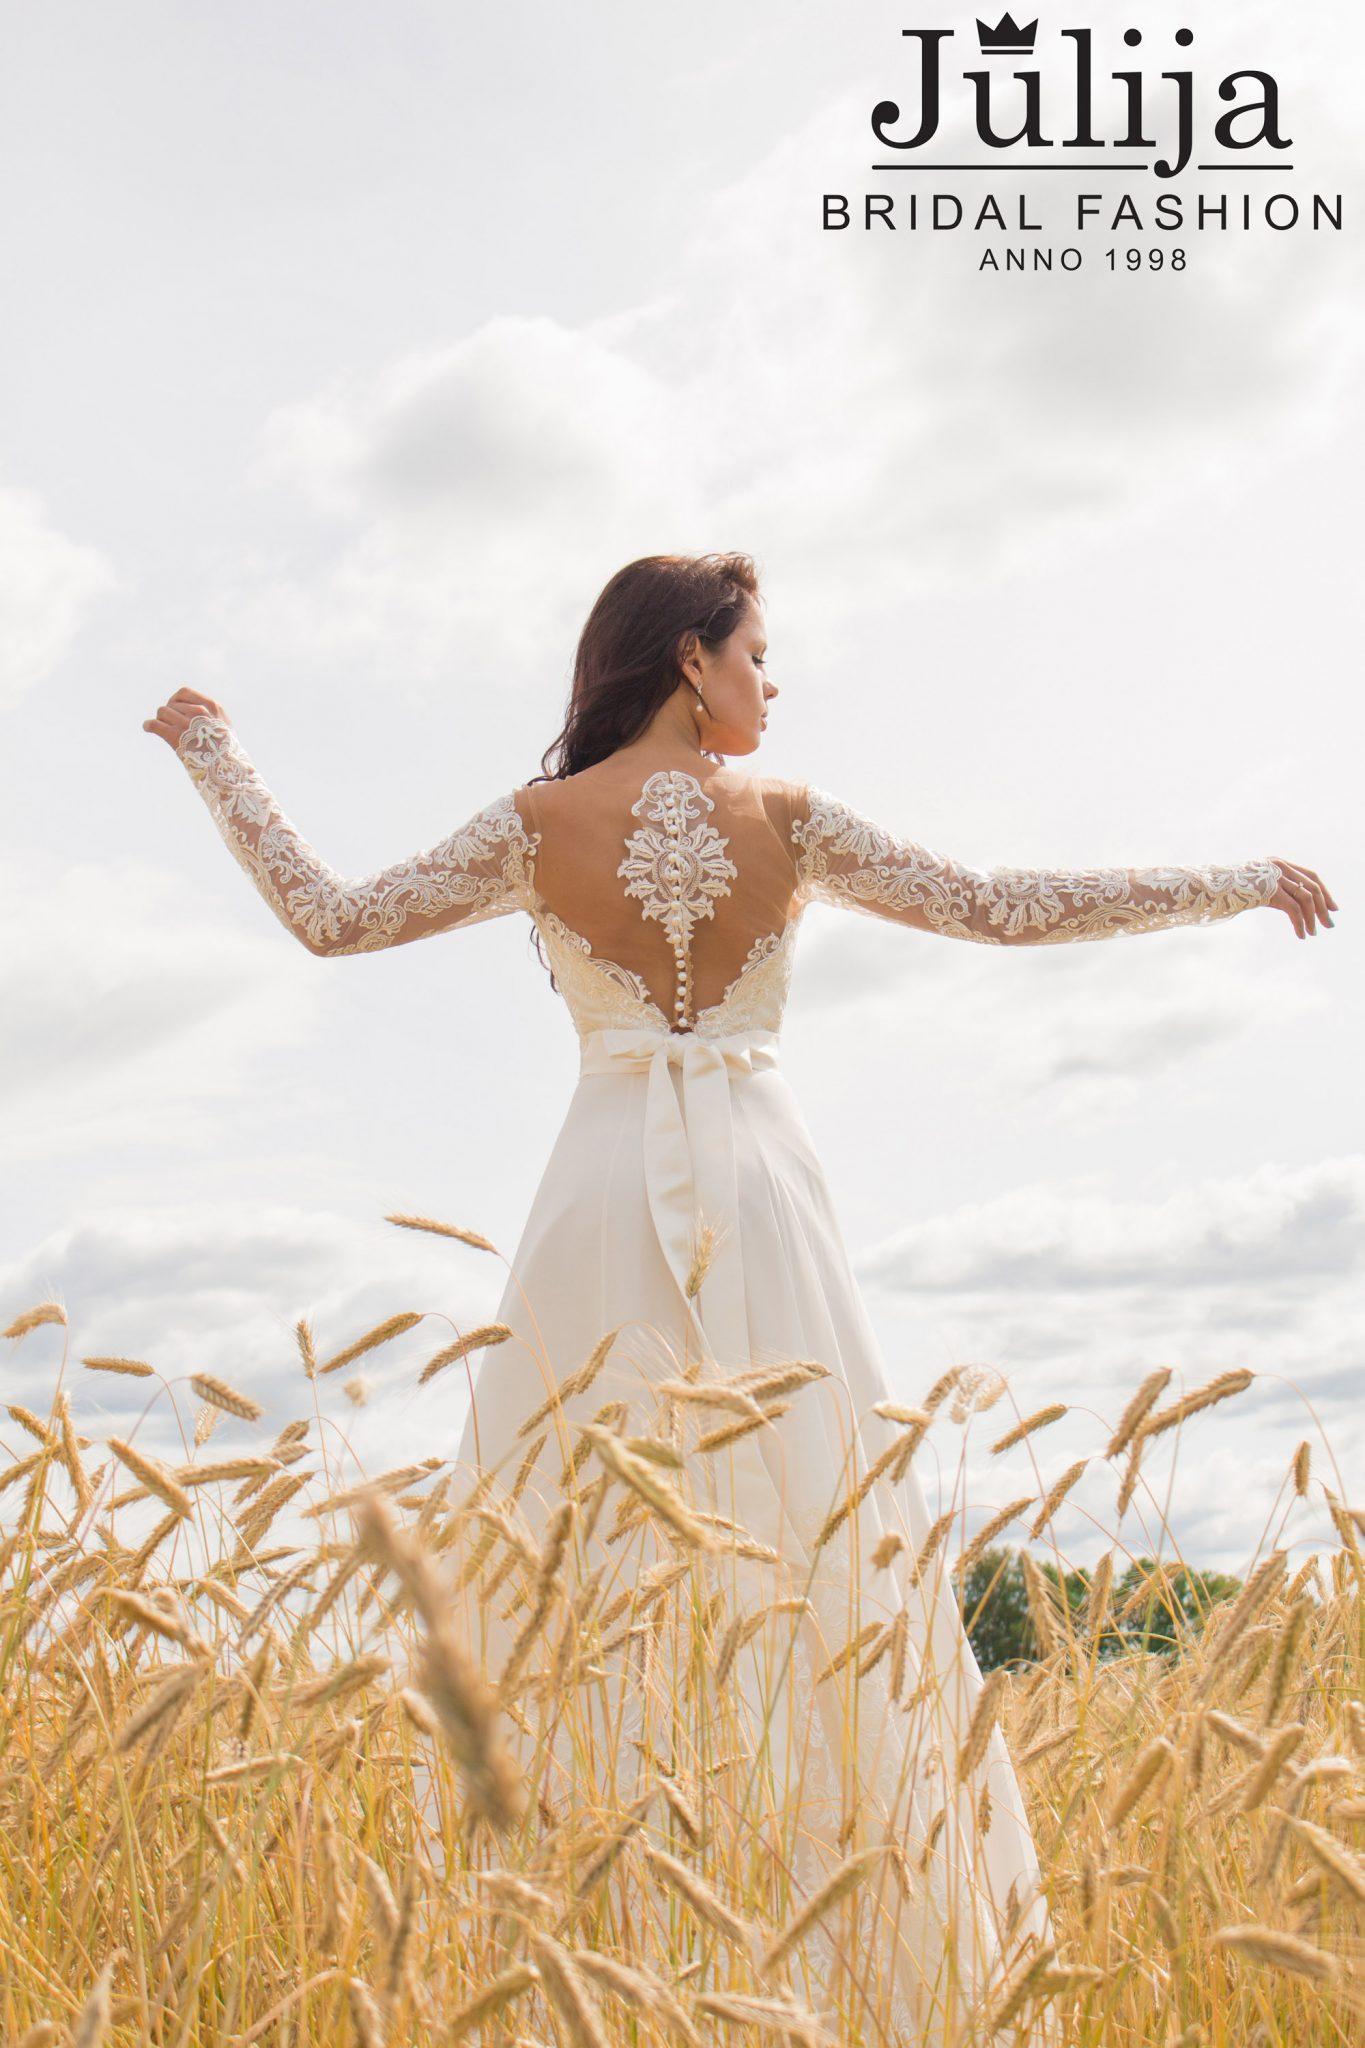 Minnesota | Wholesale wedding dresses - Julija Bridal Fashion